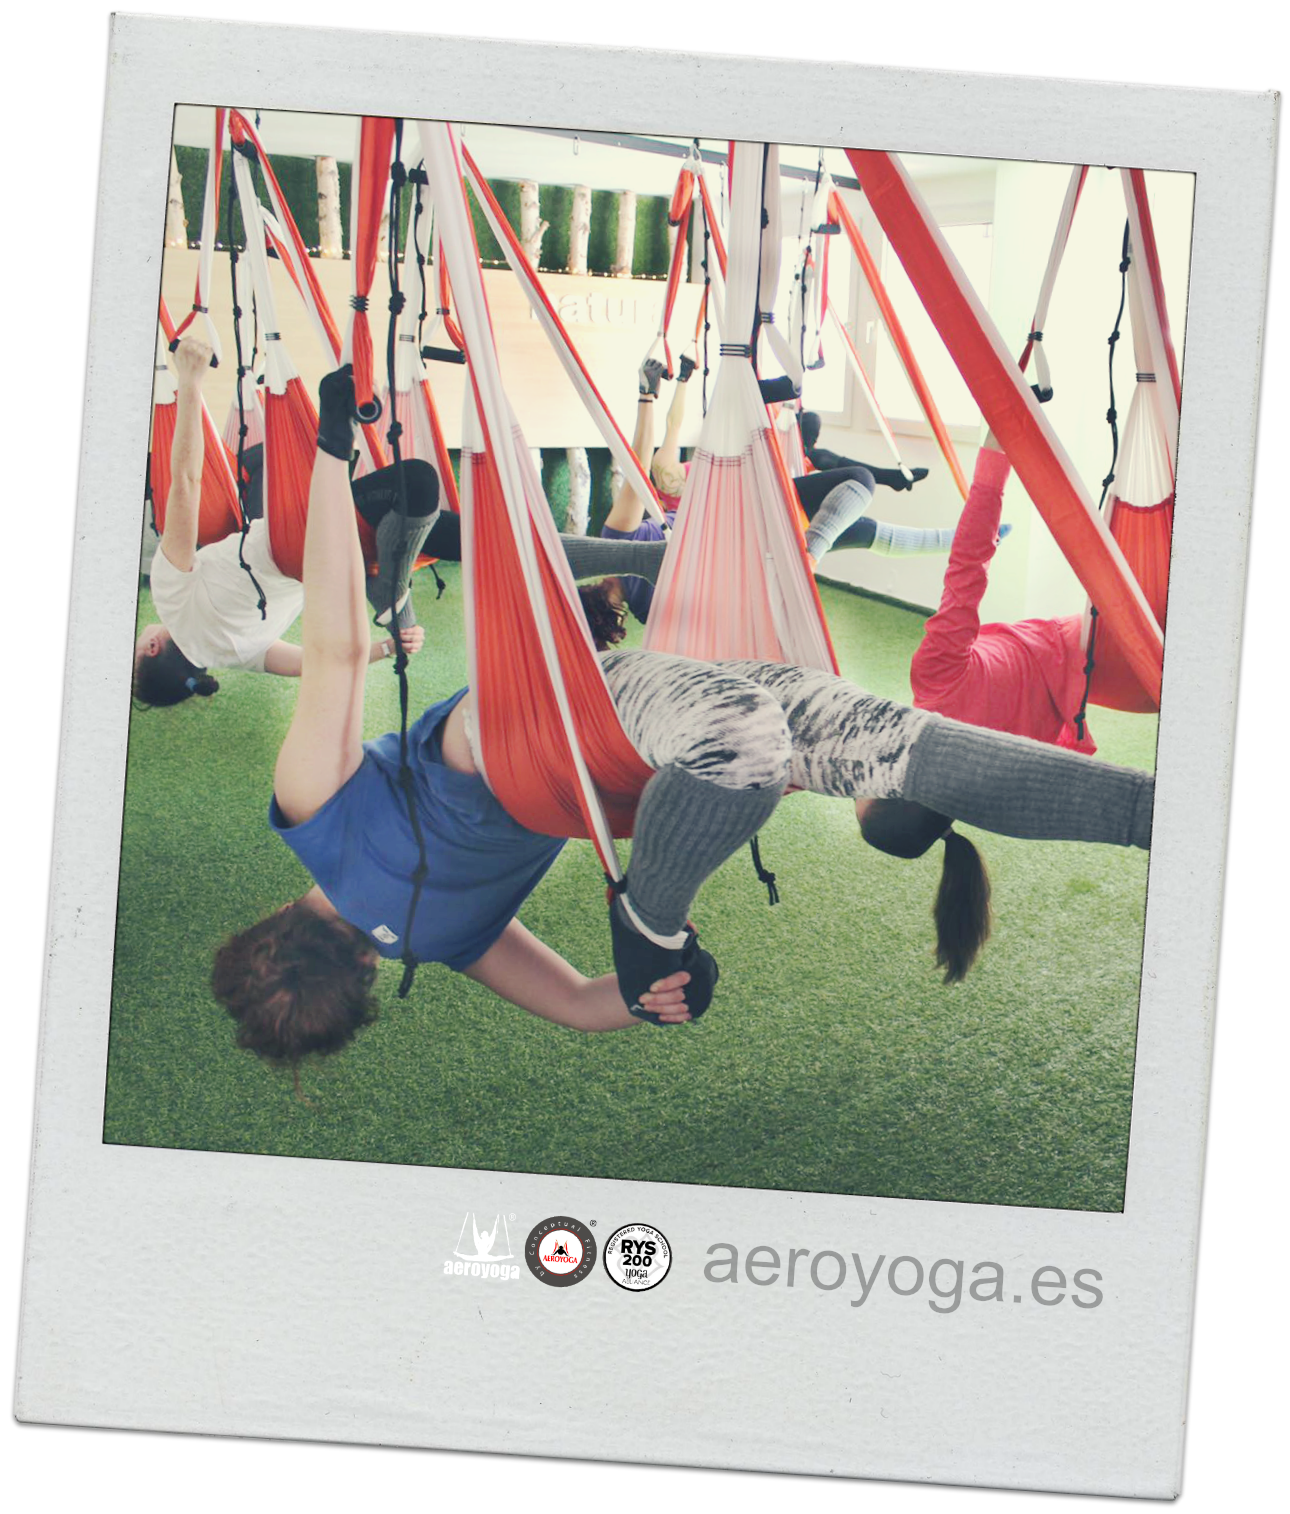 Aeroyoga Es Kids Rugs Yoga Valencia